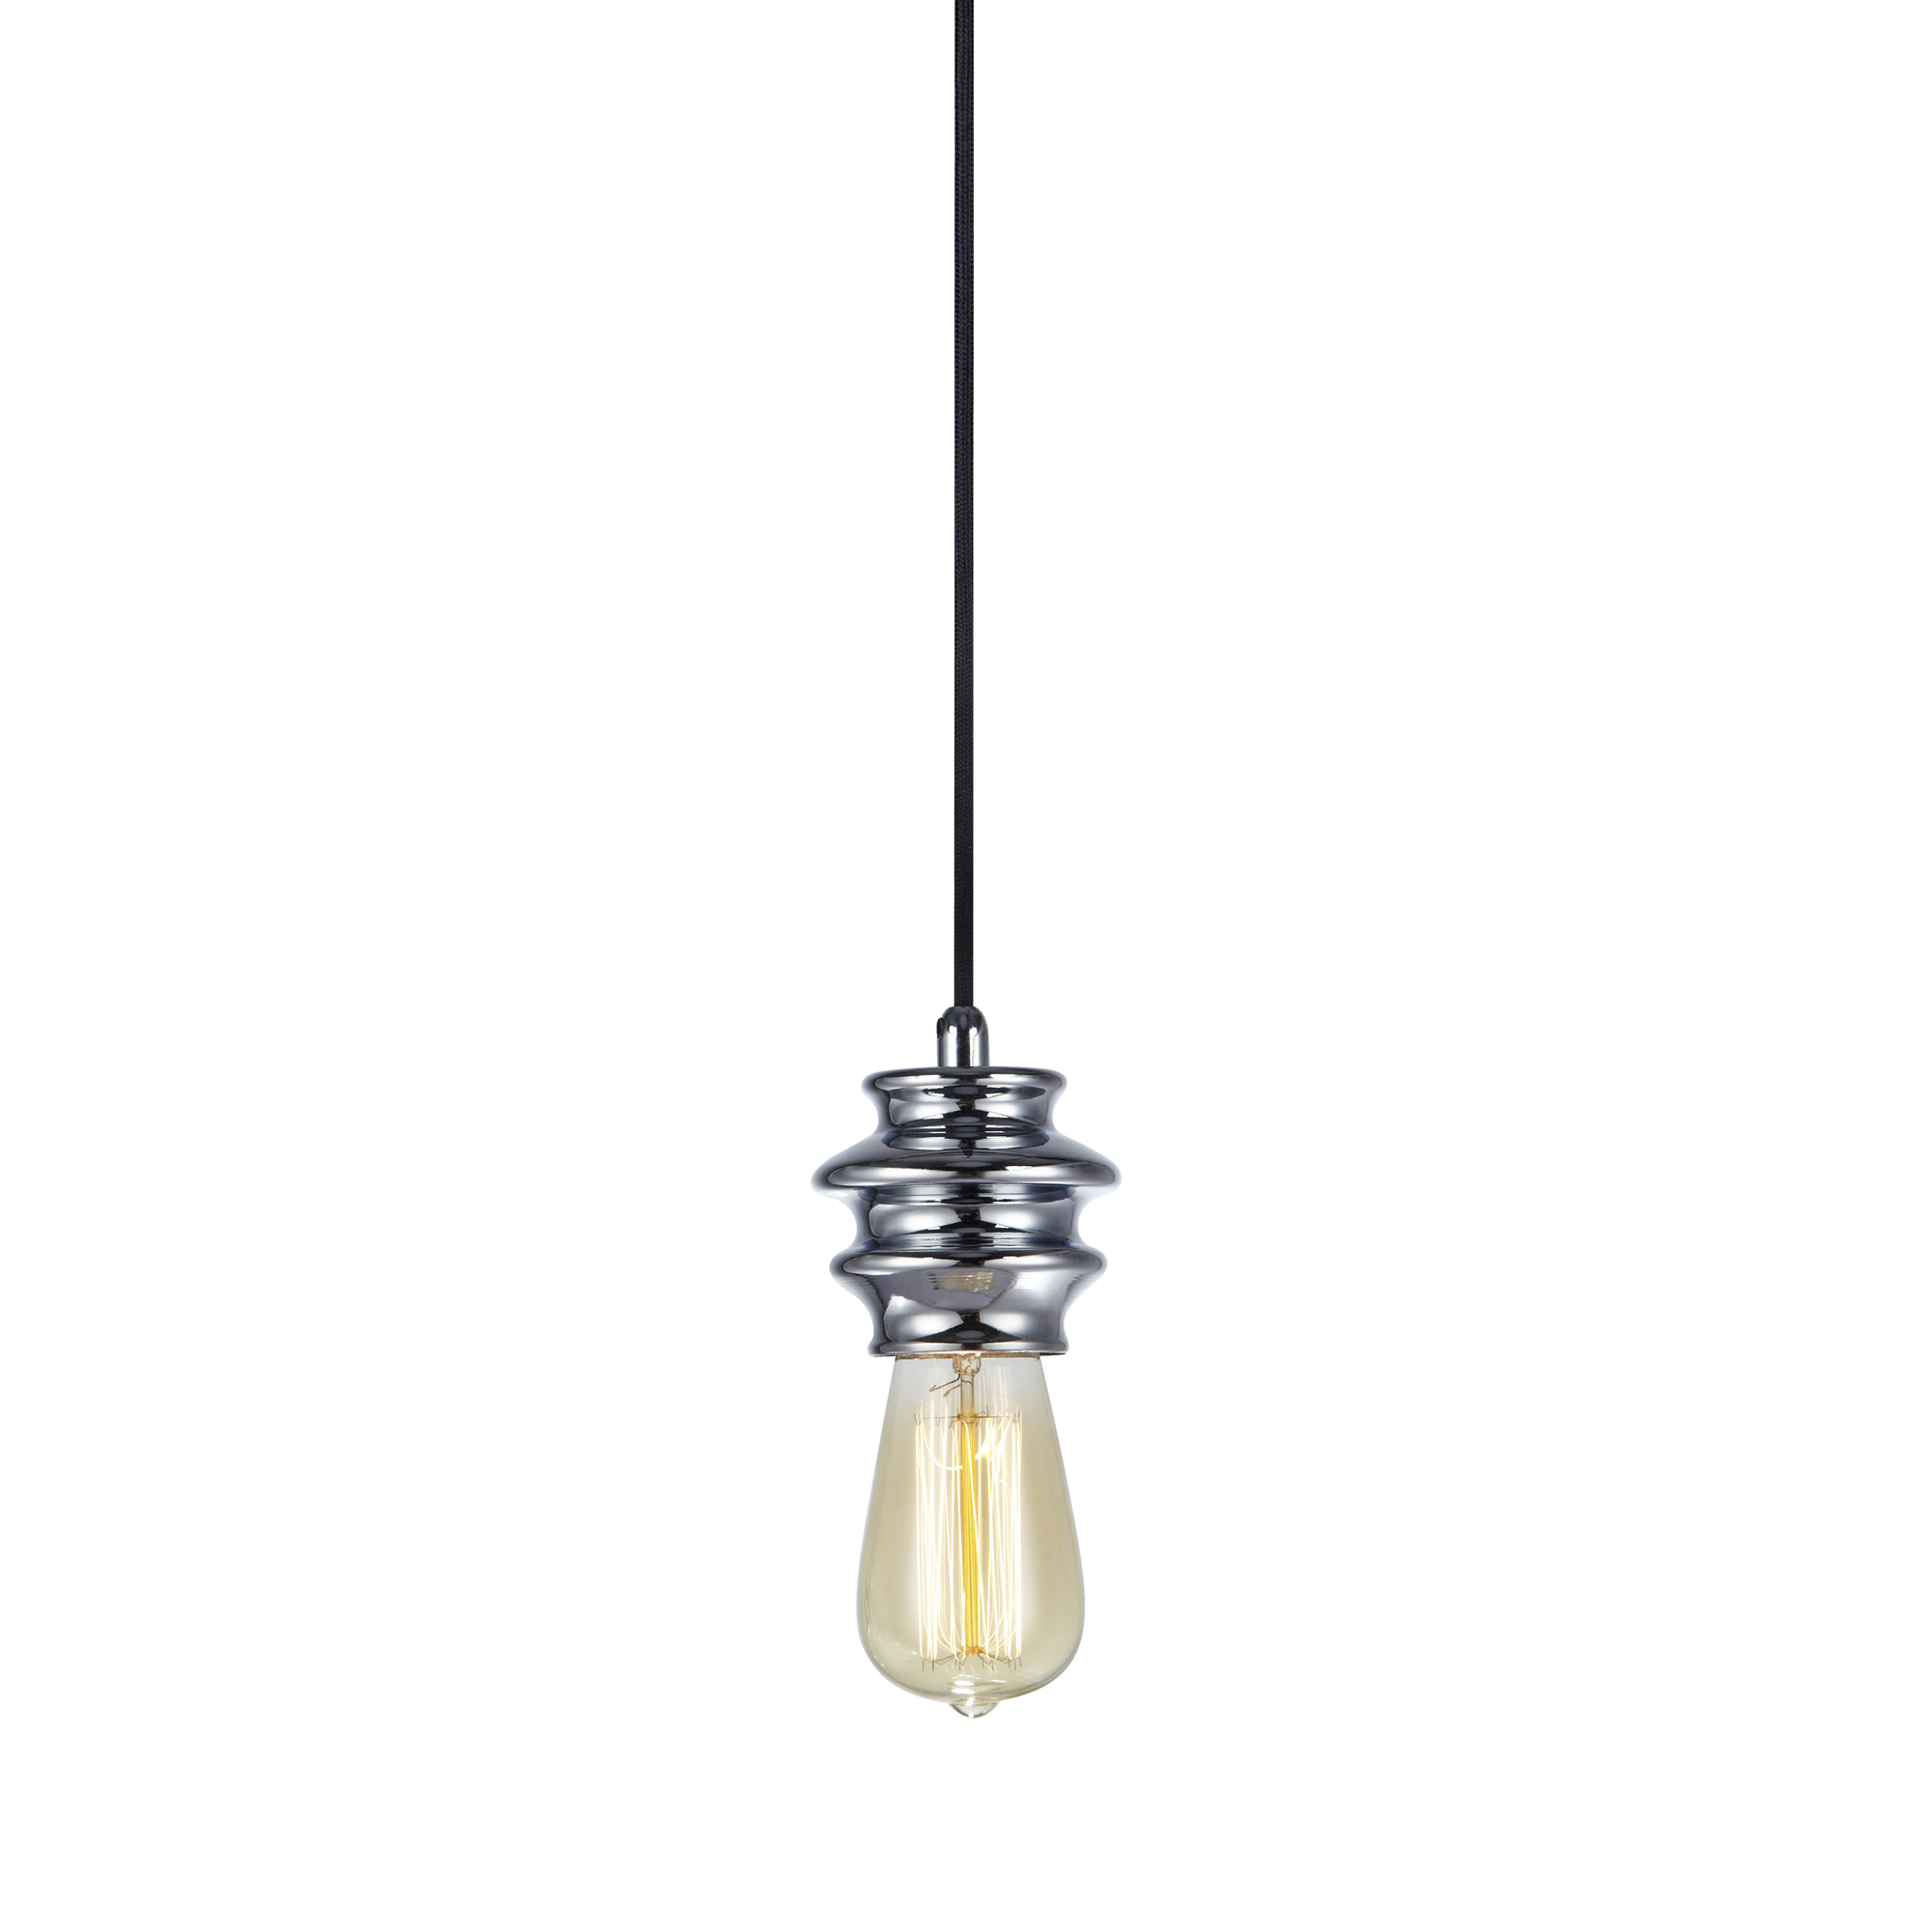 Fab 1-lichts hanglamp chroom